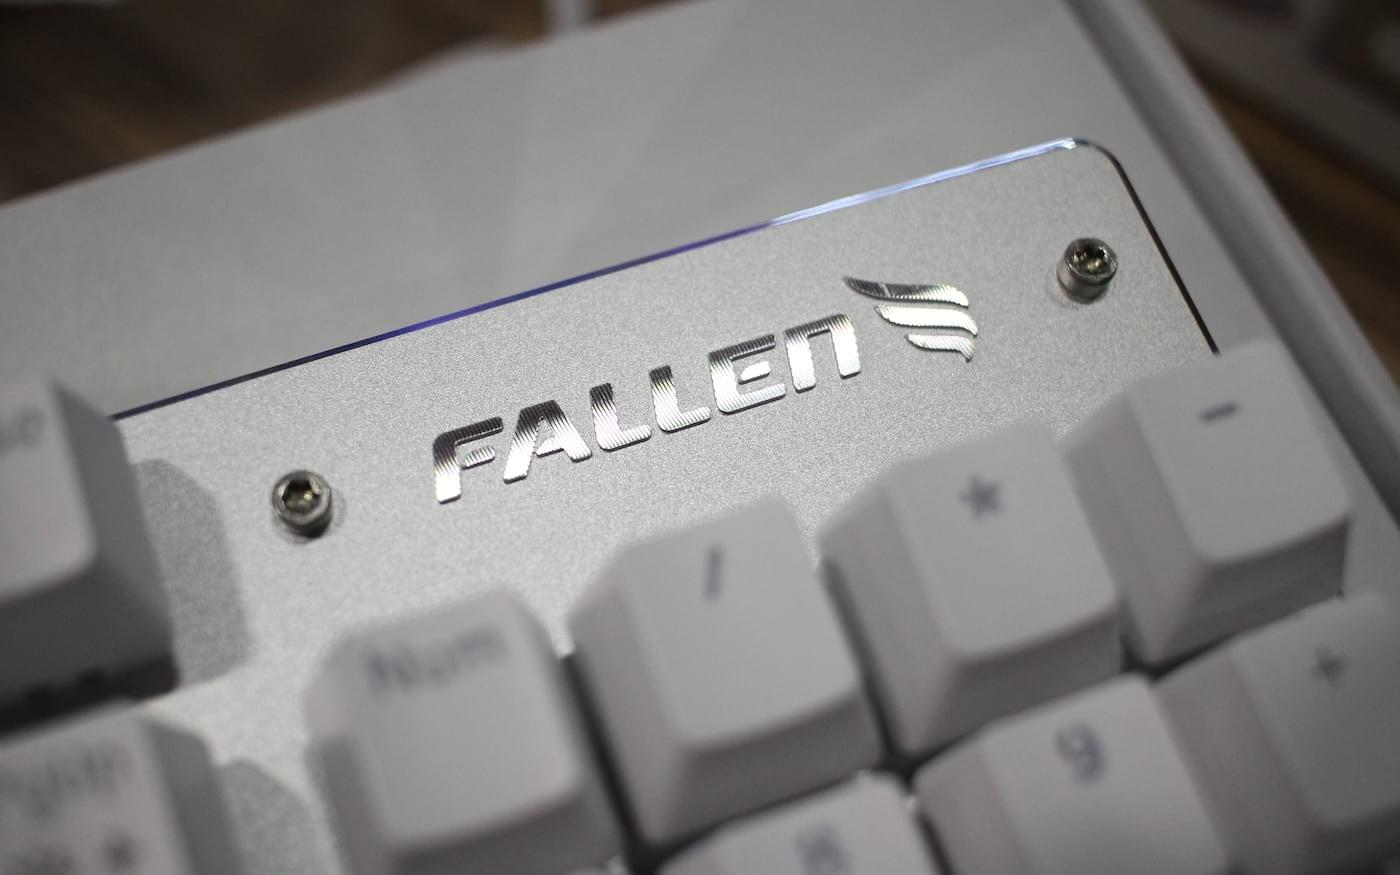 Novo teclado mecânico Fallen Gear ACE lançado por R$400